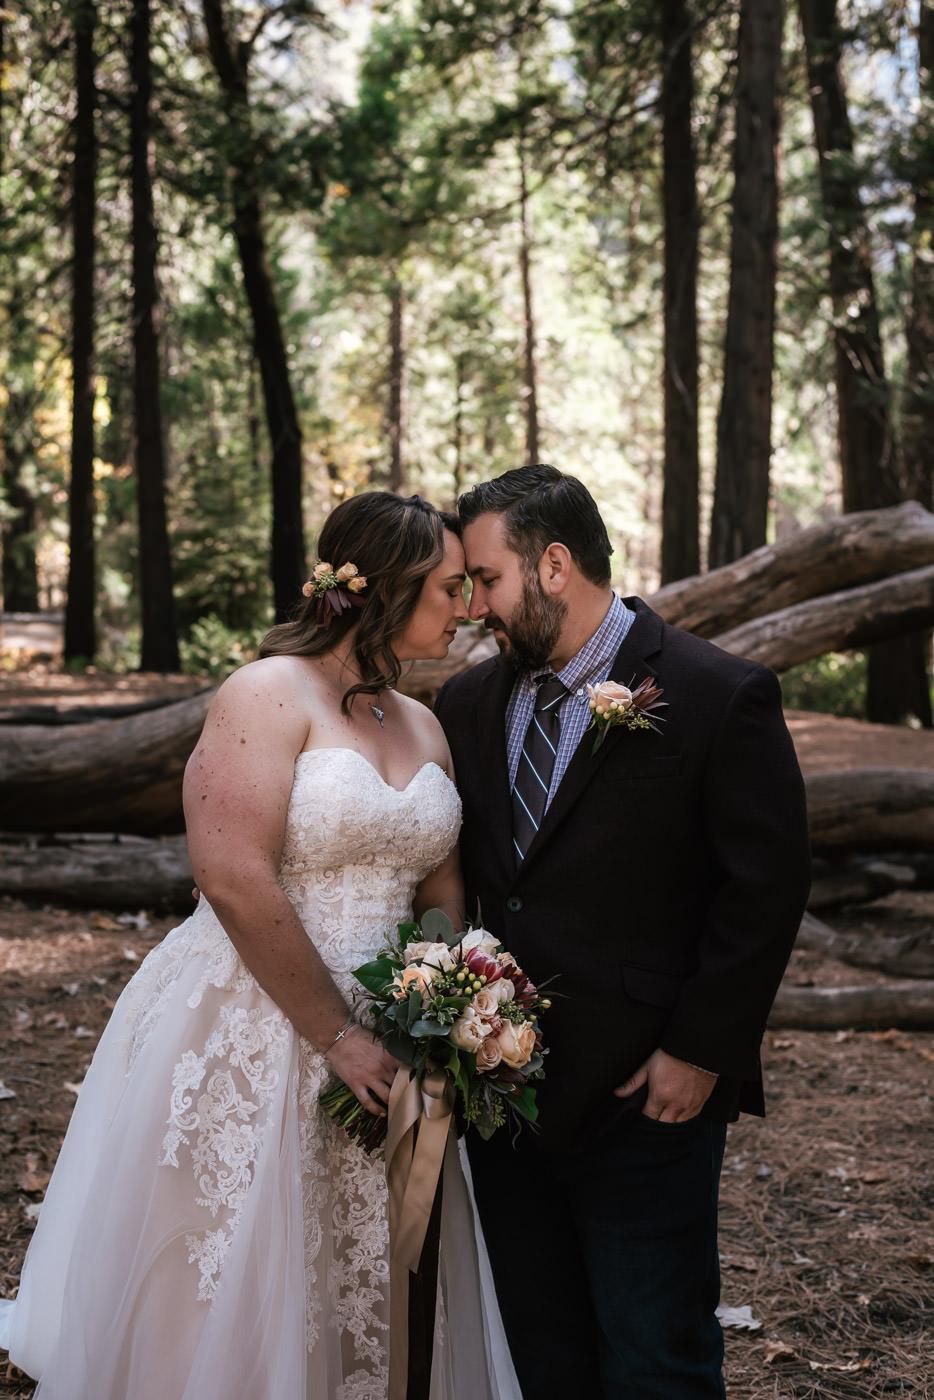 yosemite-swinging-bridge-first-look-wedding-18.jpg